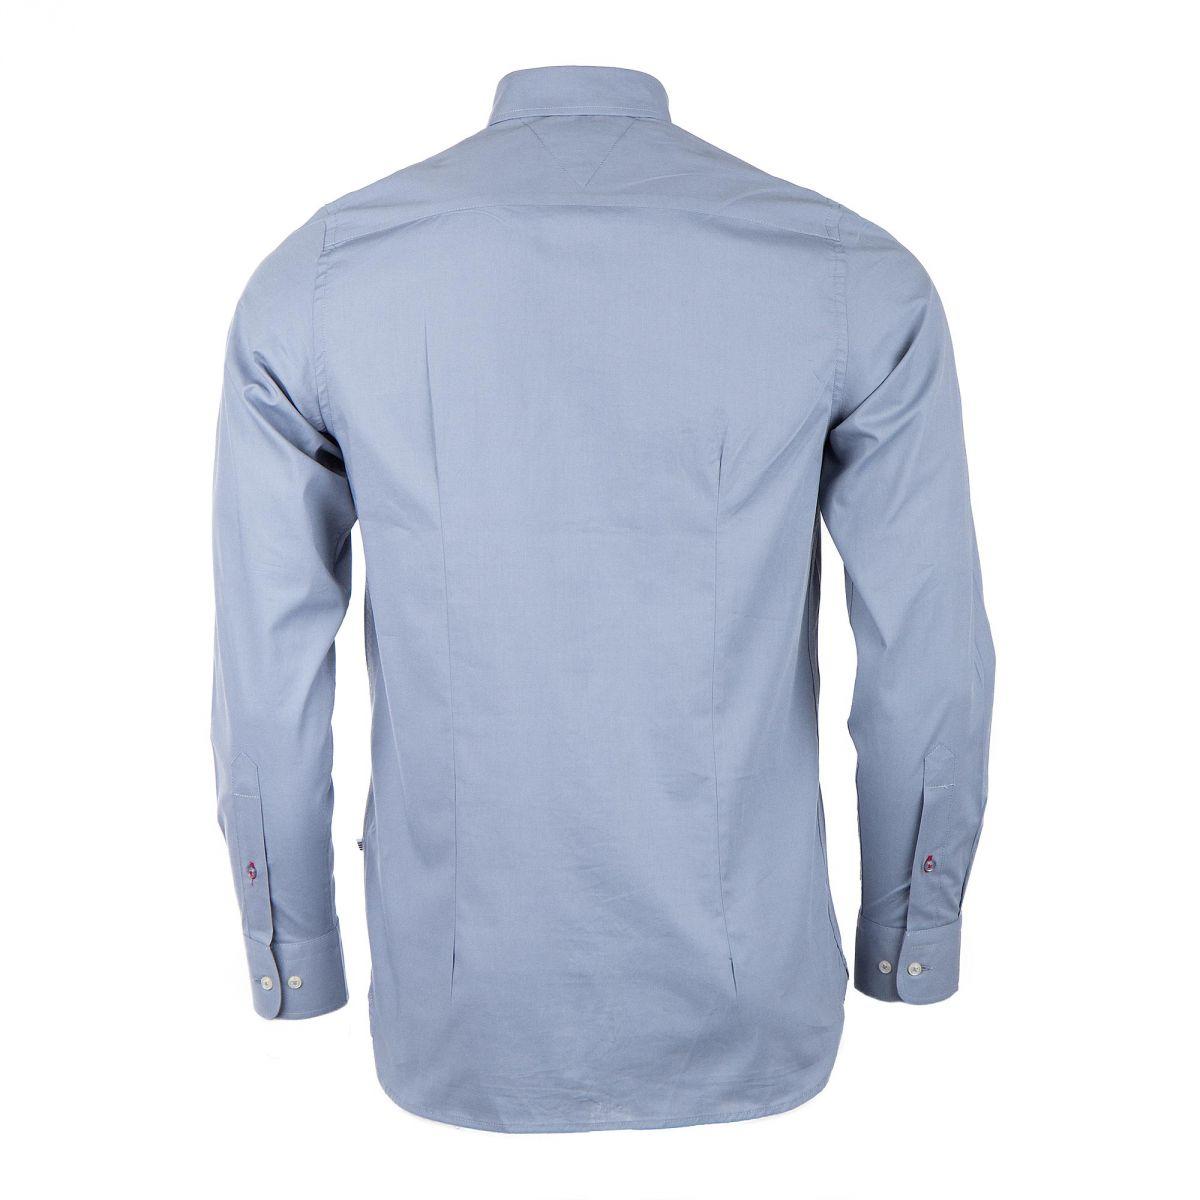 chemise manches longues bleu gris homme tommy hilfiger prix. Black Bedroom Furniture Sets. Home Design Ideas